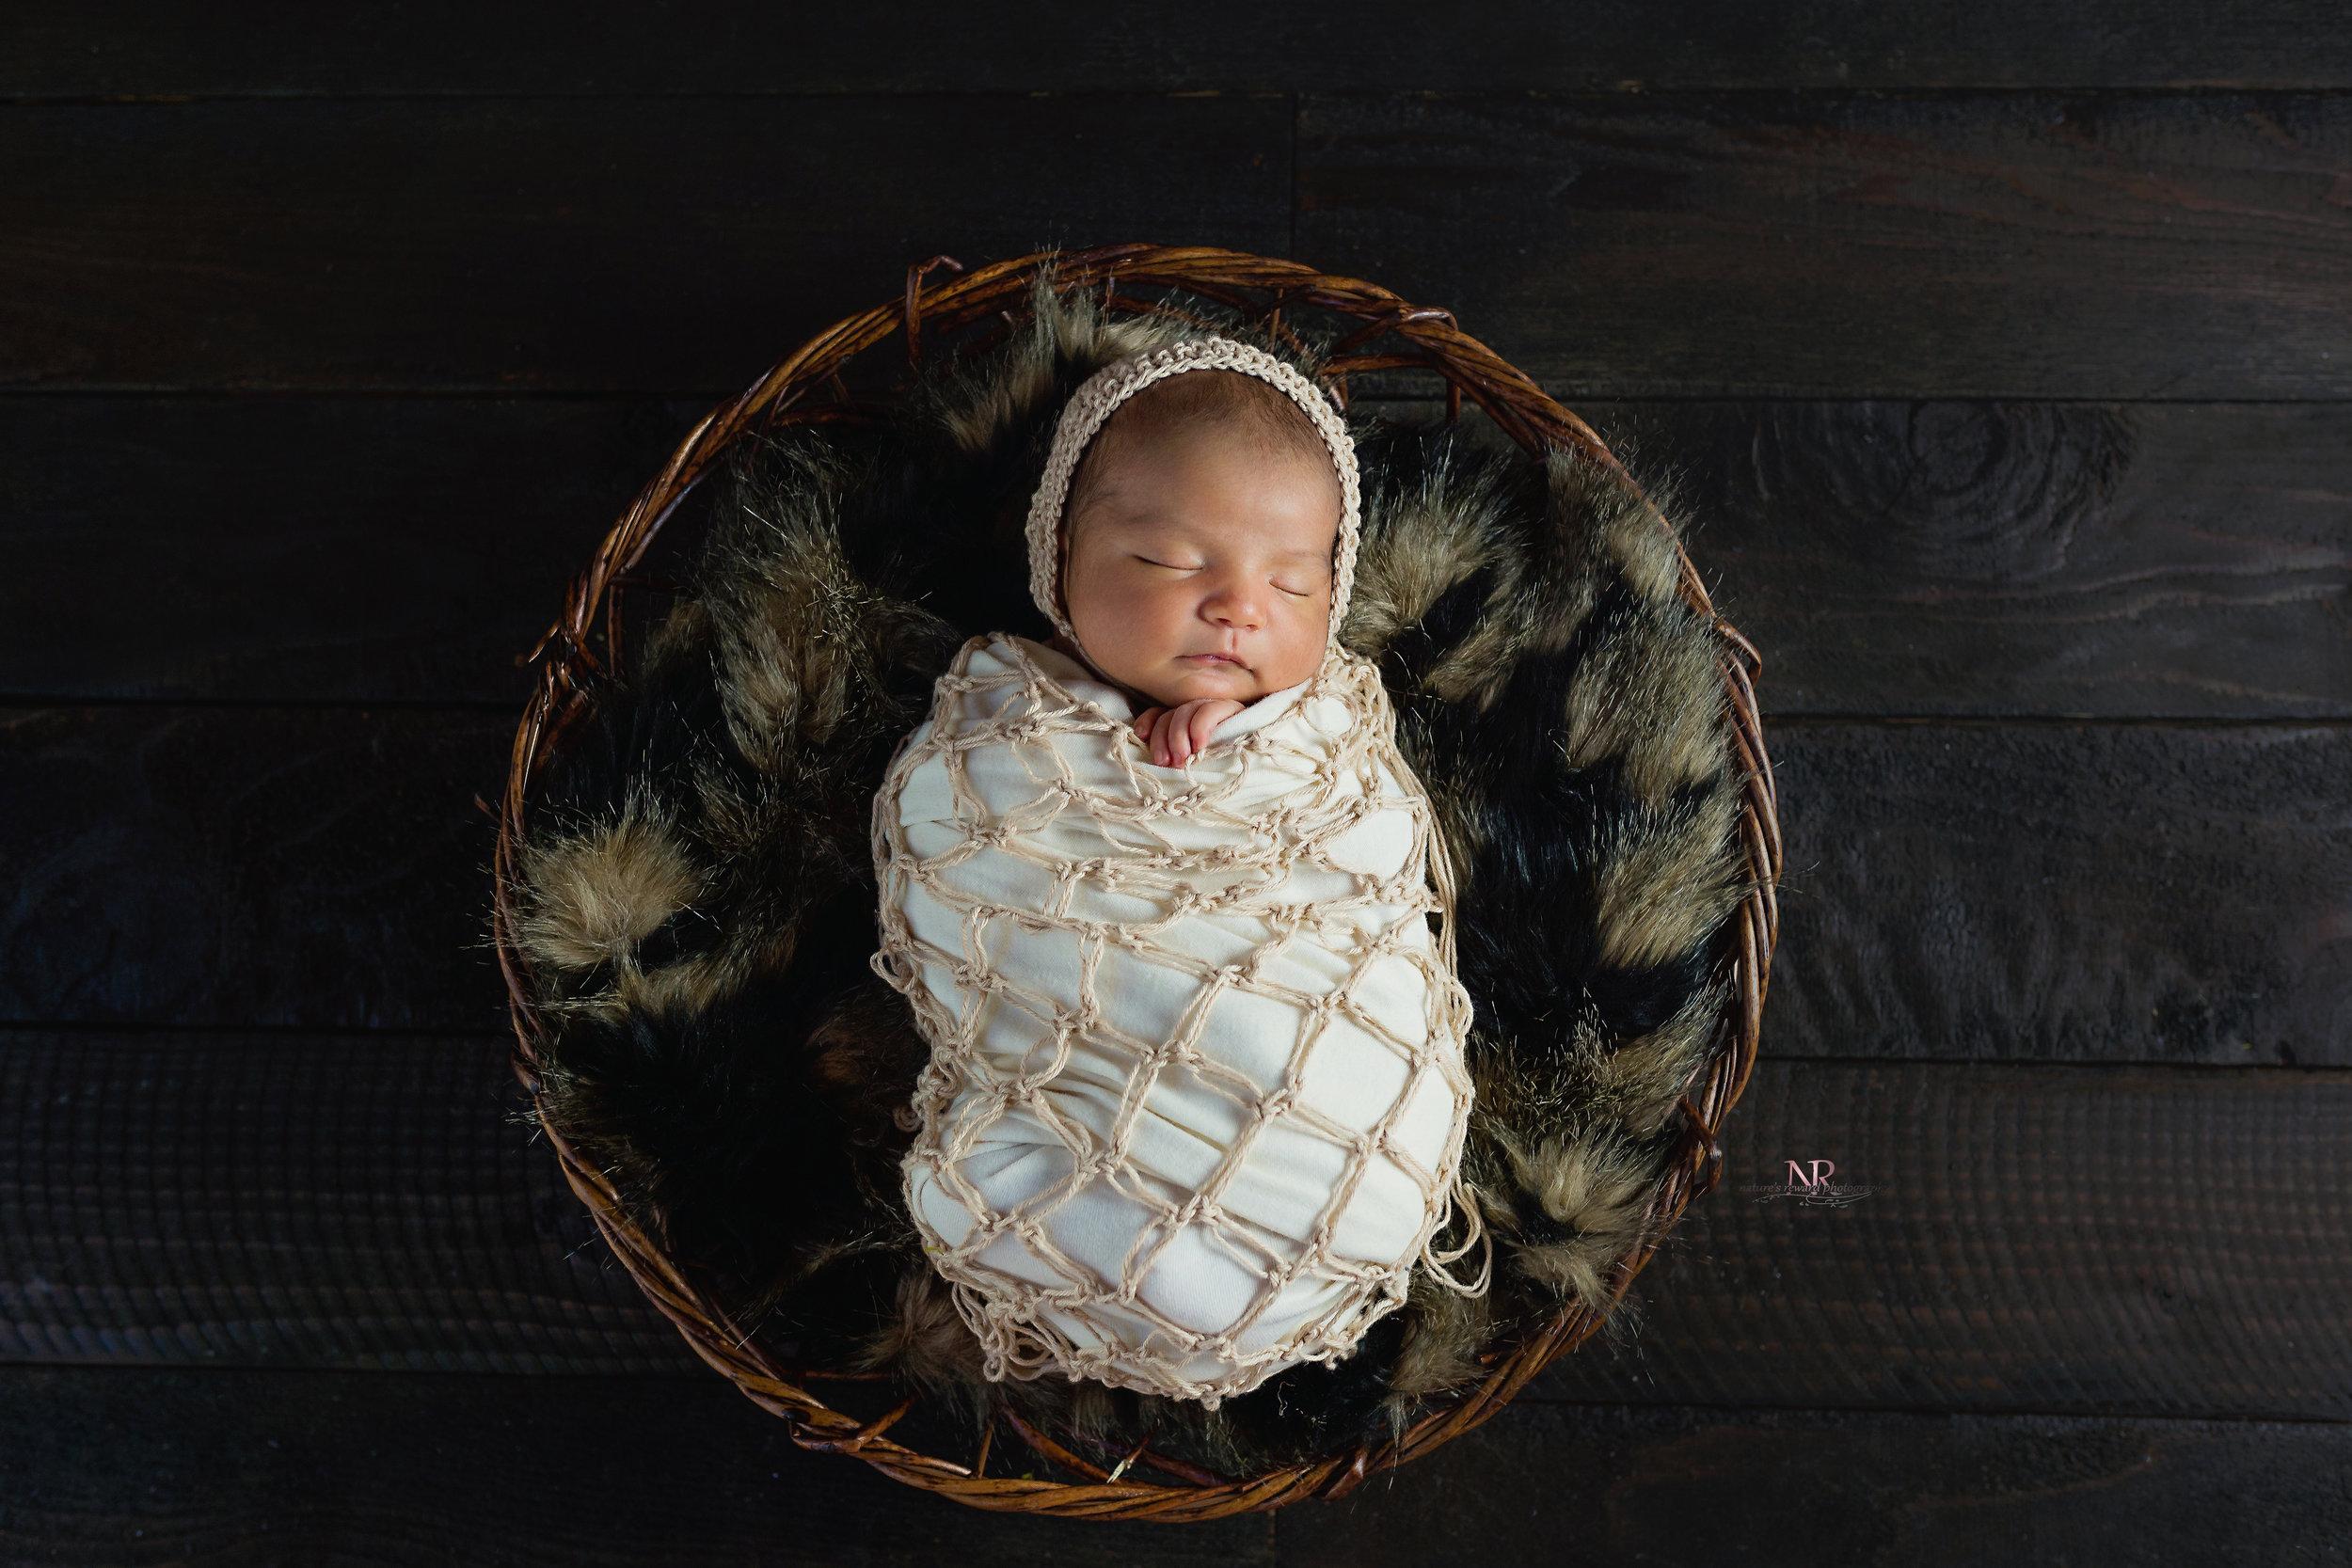 newborn swaddled in a bowl